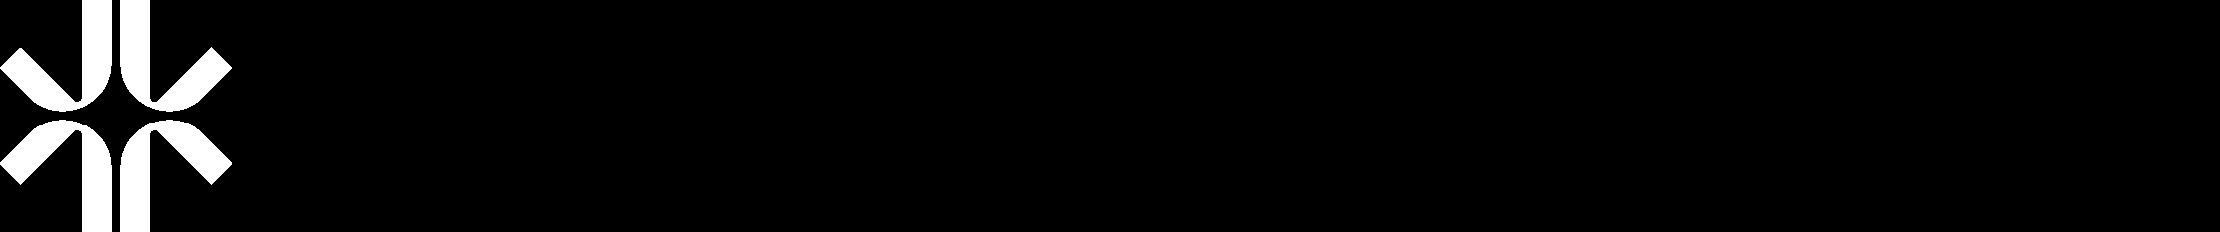 k-logo-white-2C